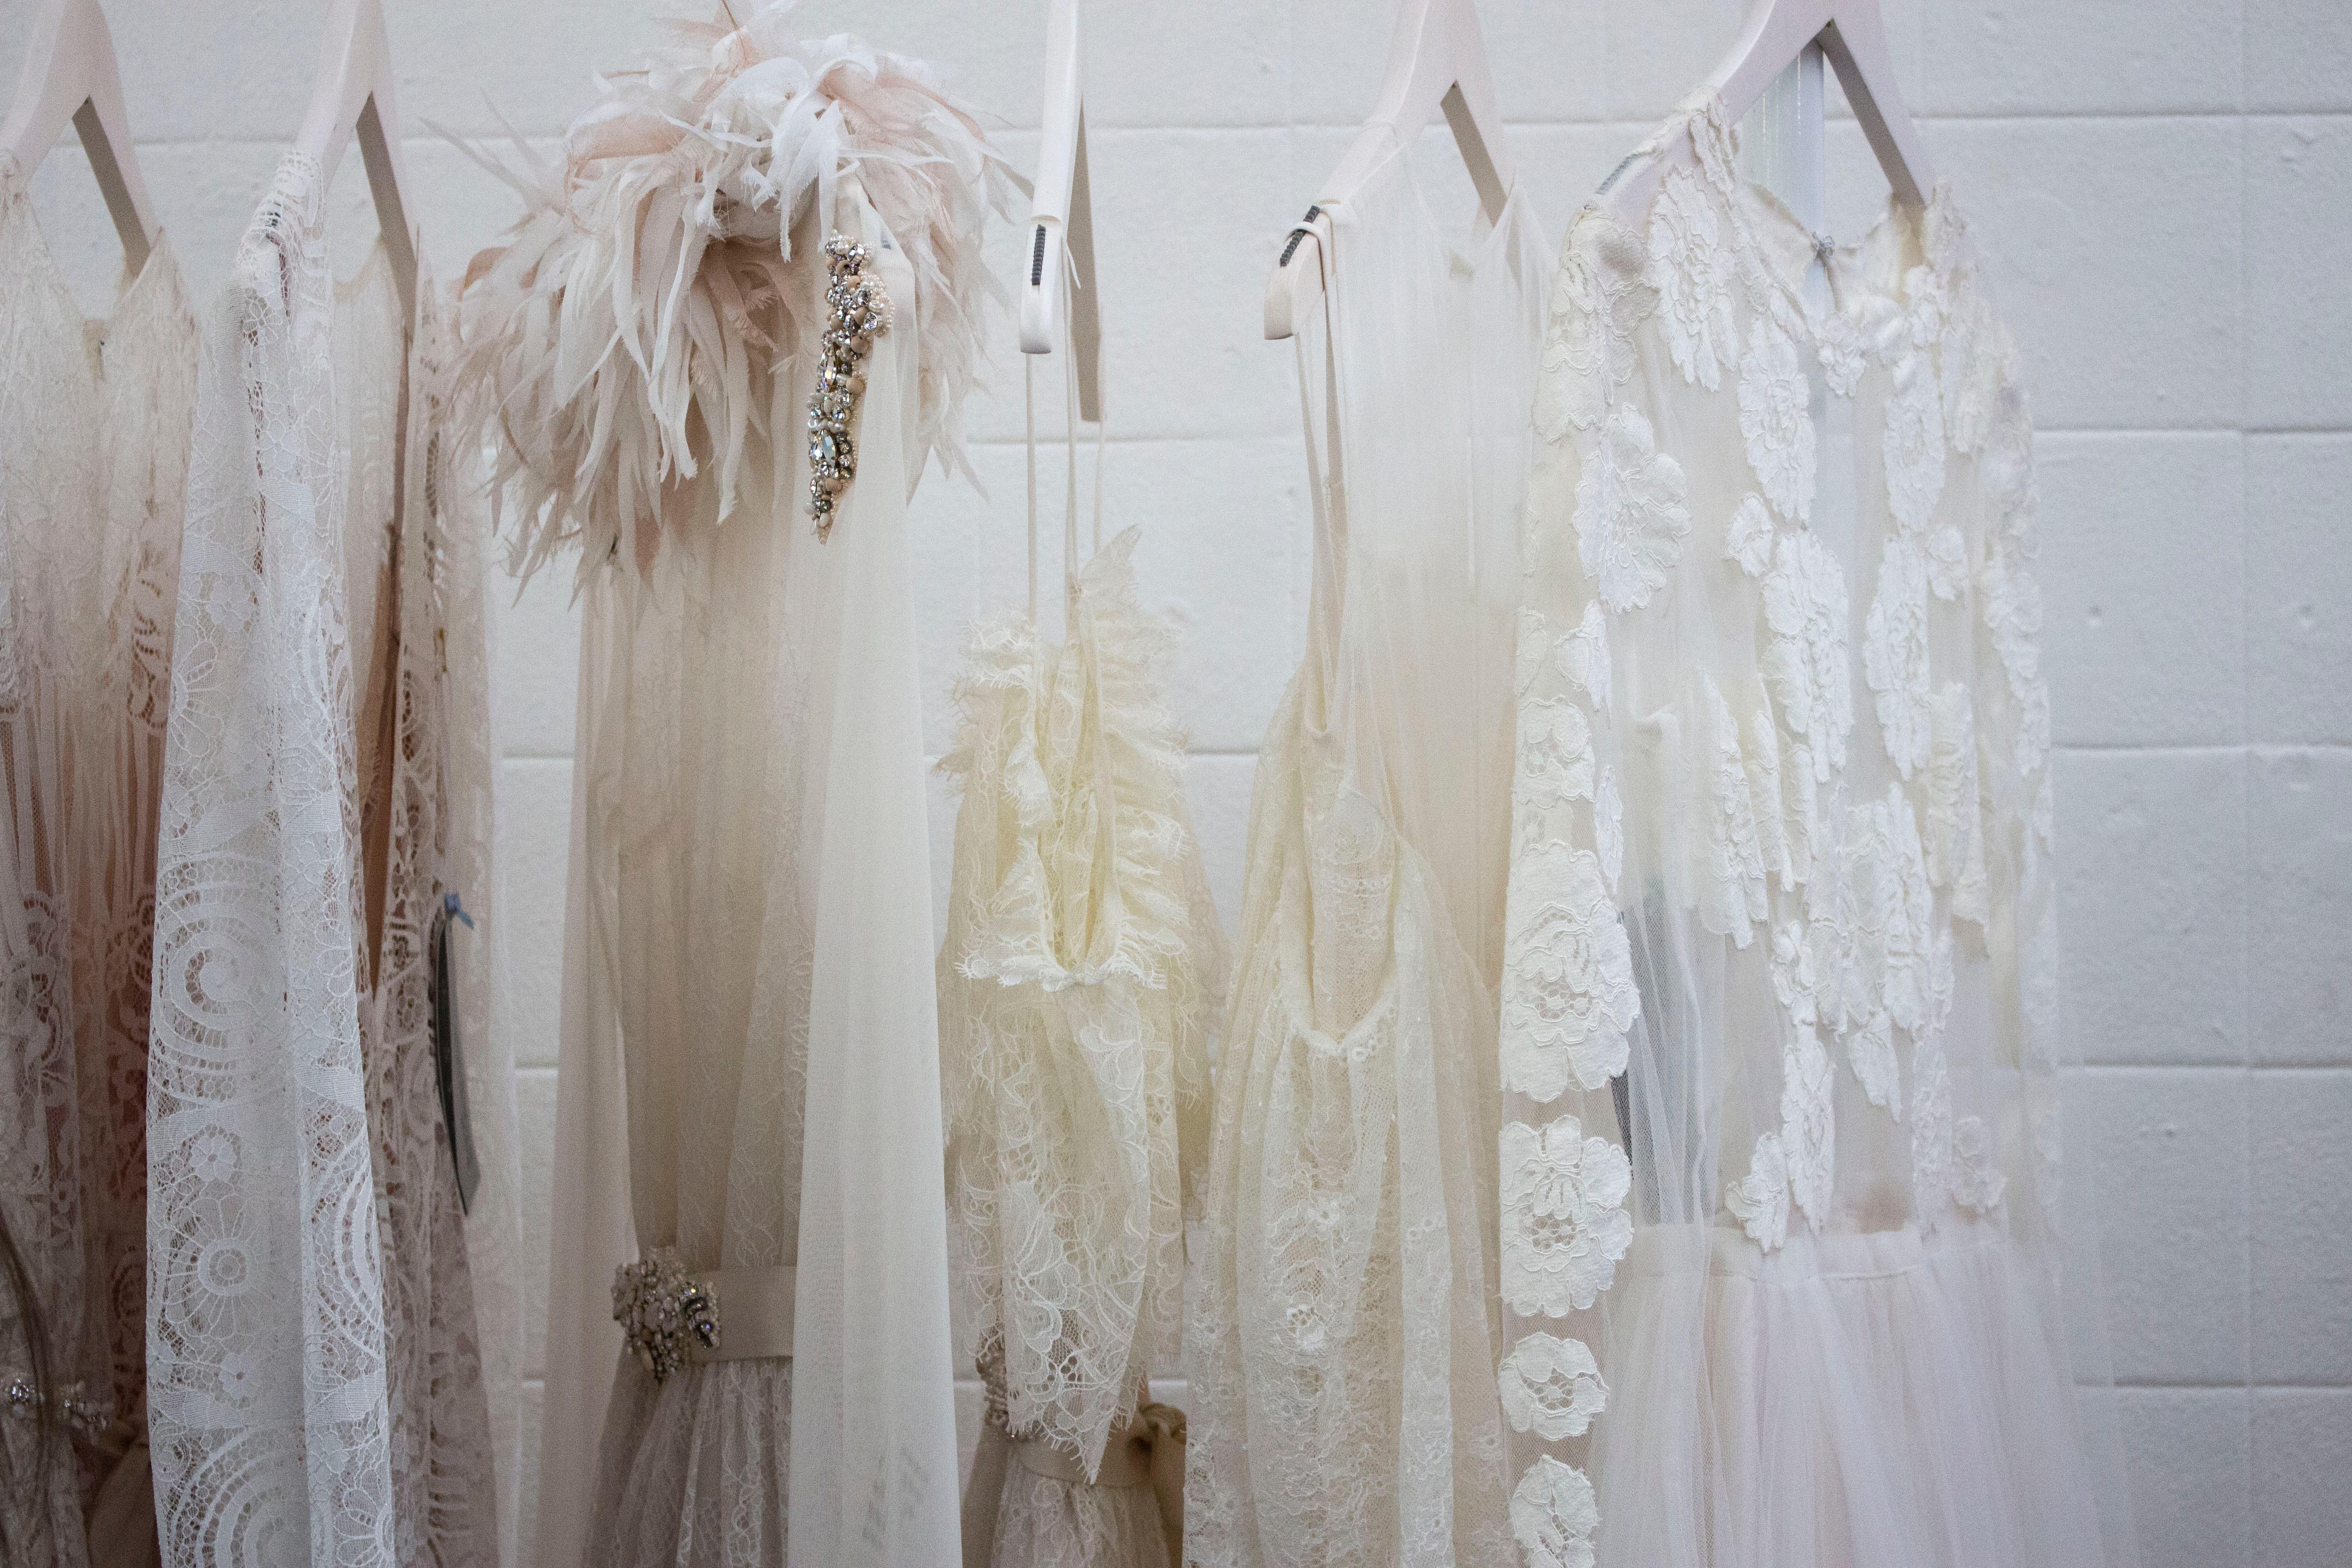 Vêtements blancs